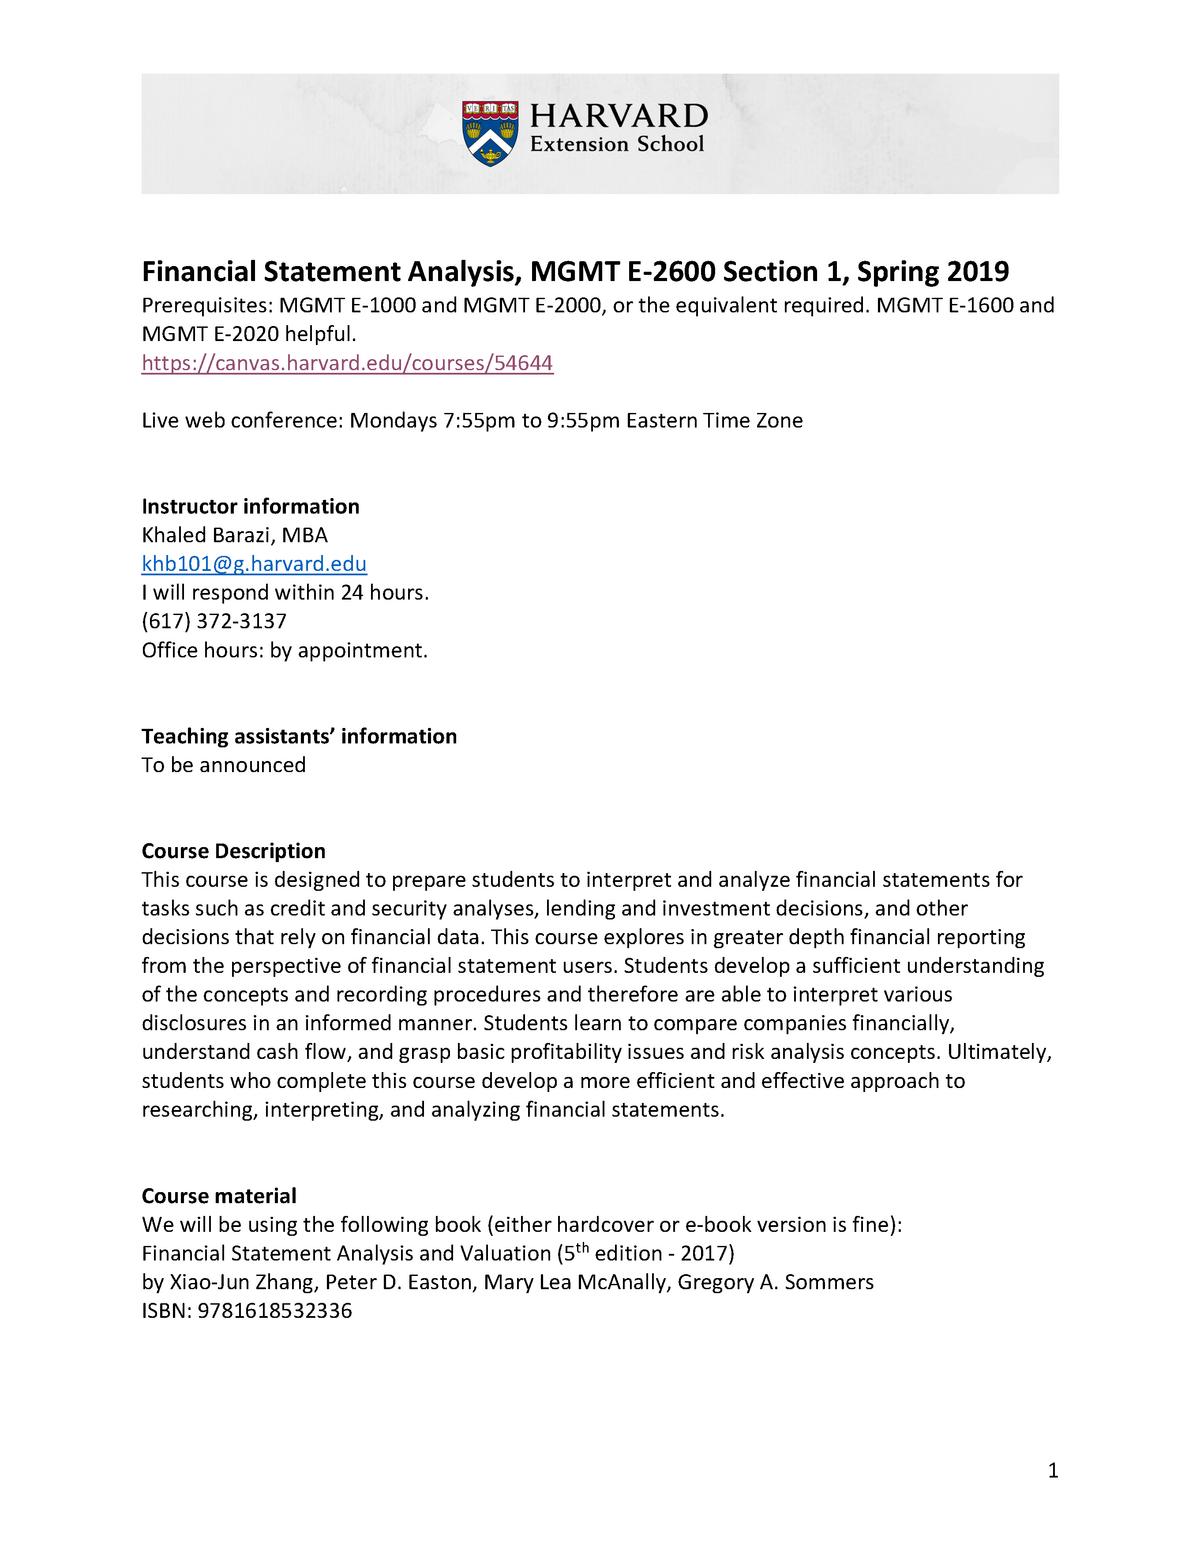 MGMT E-2600 Syllabus Spring 2019 - HBSMBA 1306 - StuDocu